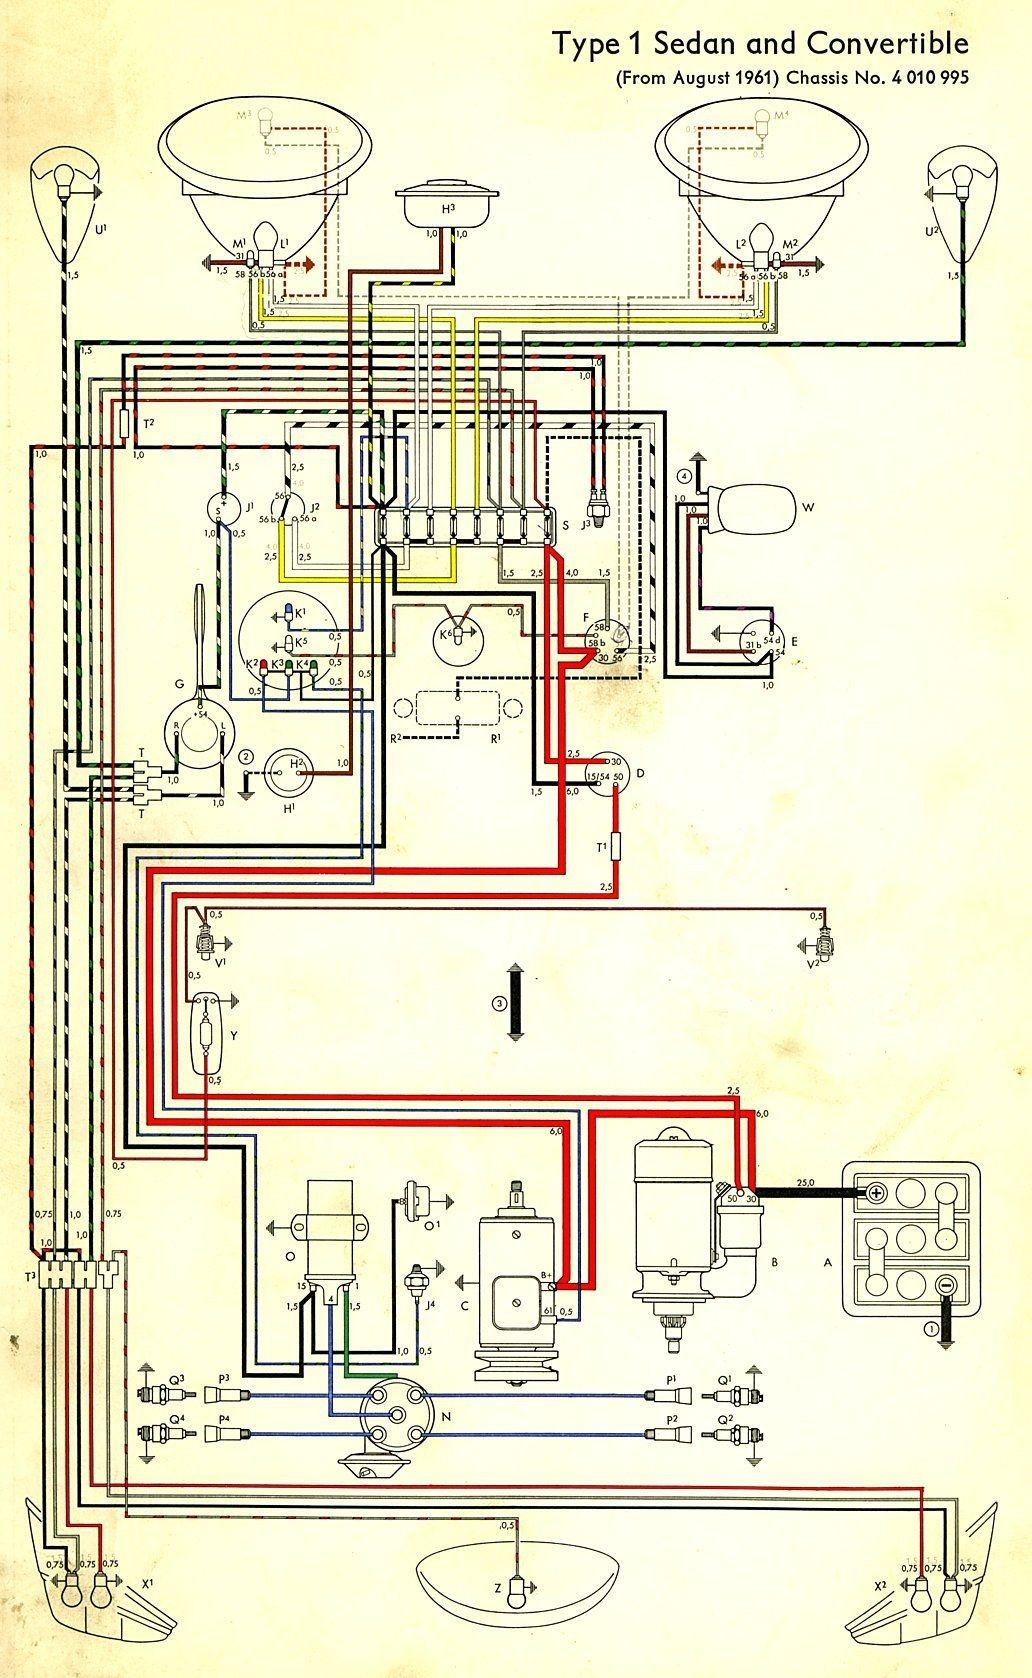 Inspirational Vw Dune Buggy Wiring Diagram In 2020 Vw Dune Buggy Vw Beetles Vw Bug